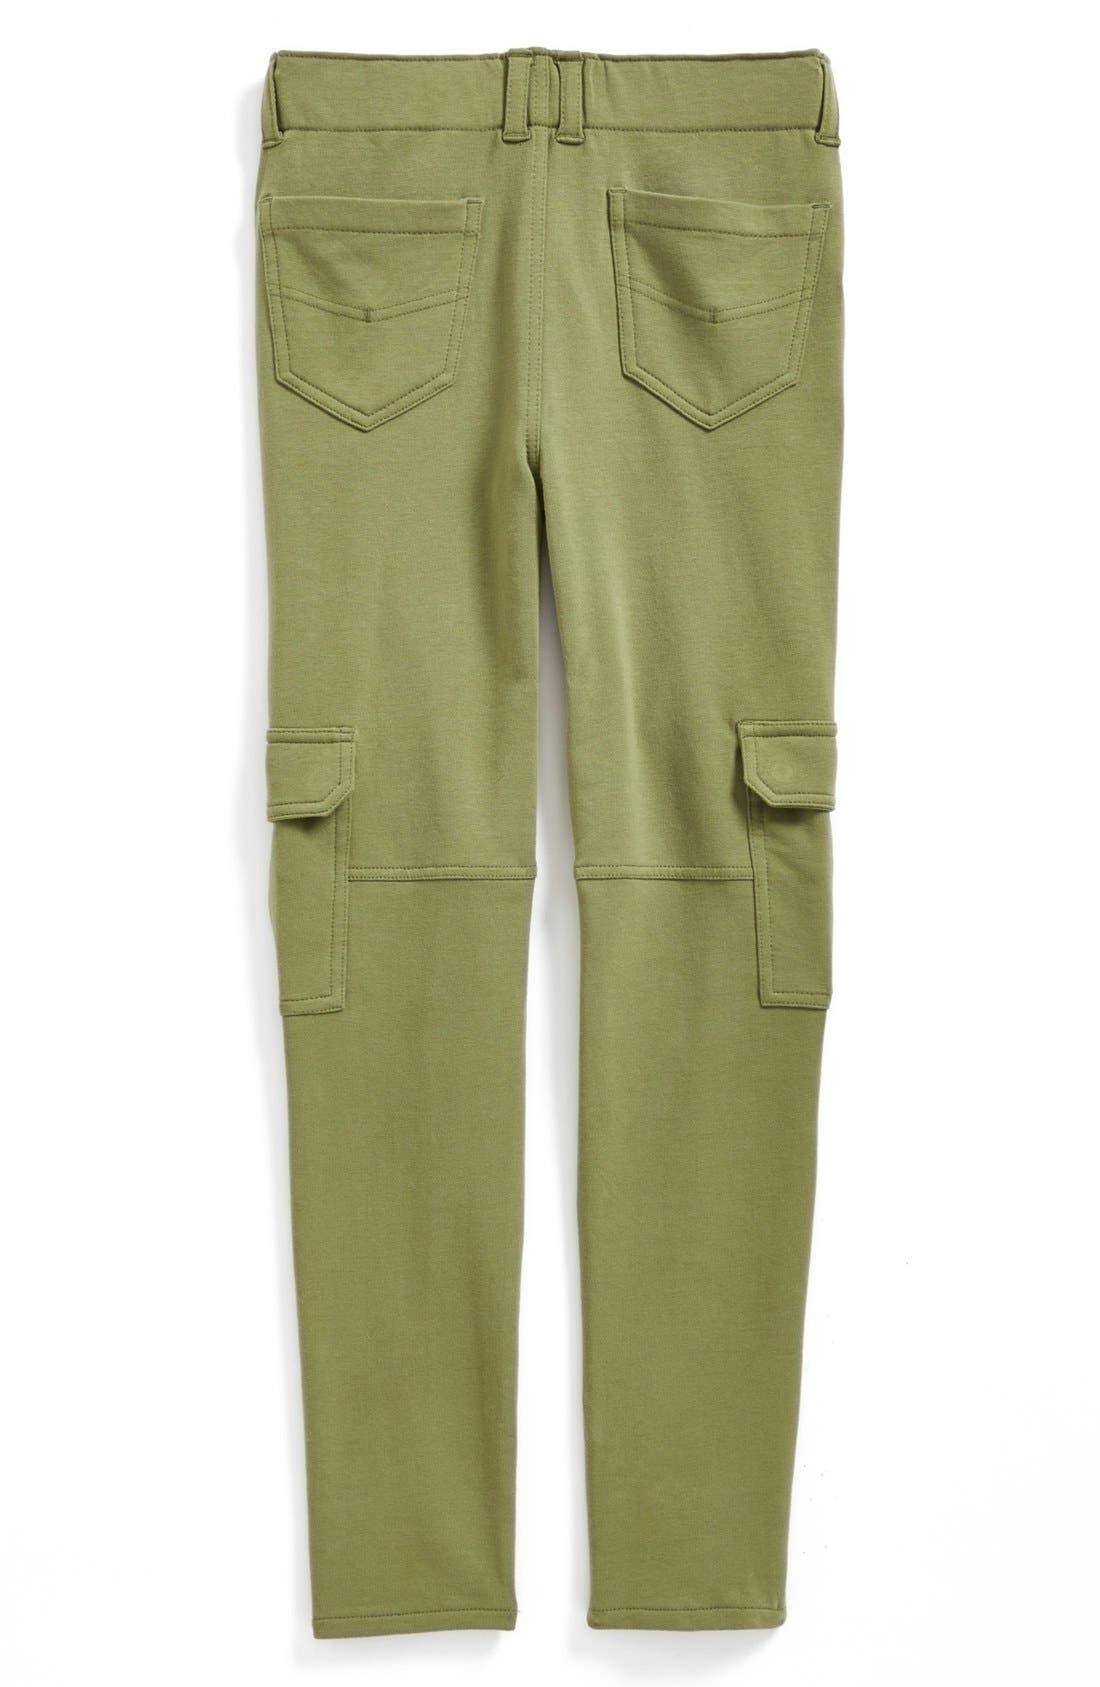 Alternate Image 1 Selected - Tucker + Tate 'Ella' Knit Cargo Pants (Big Girls)